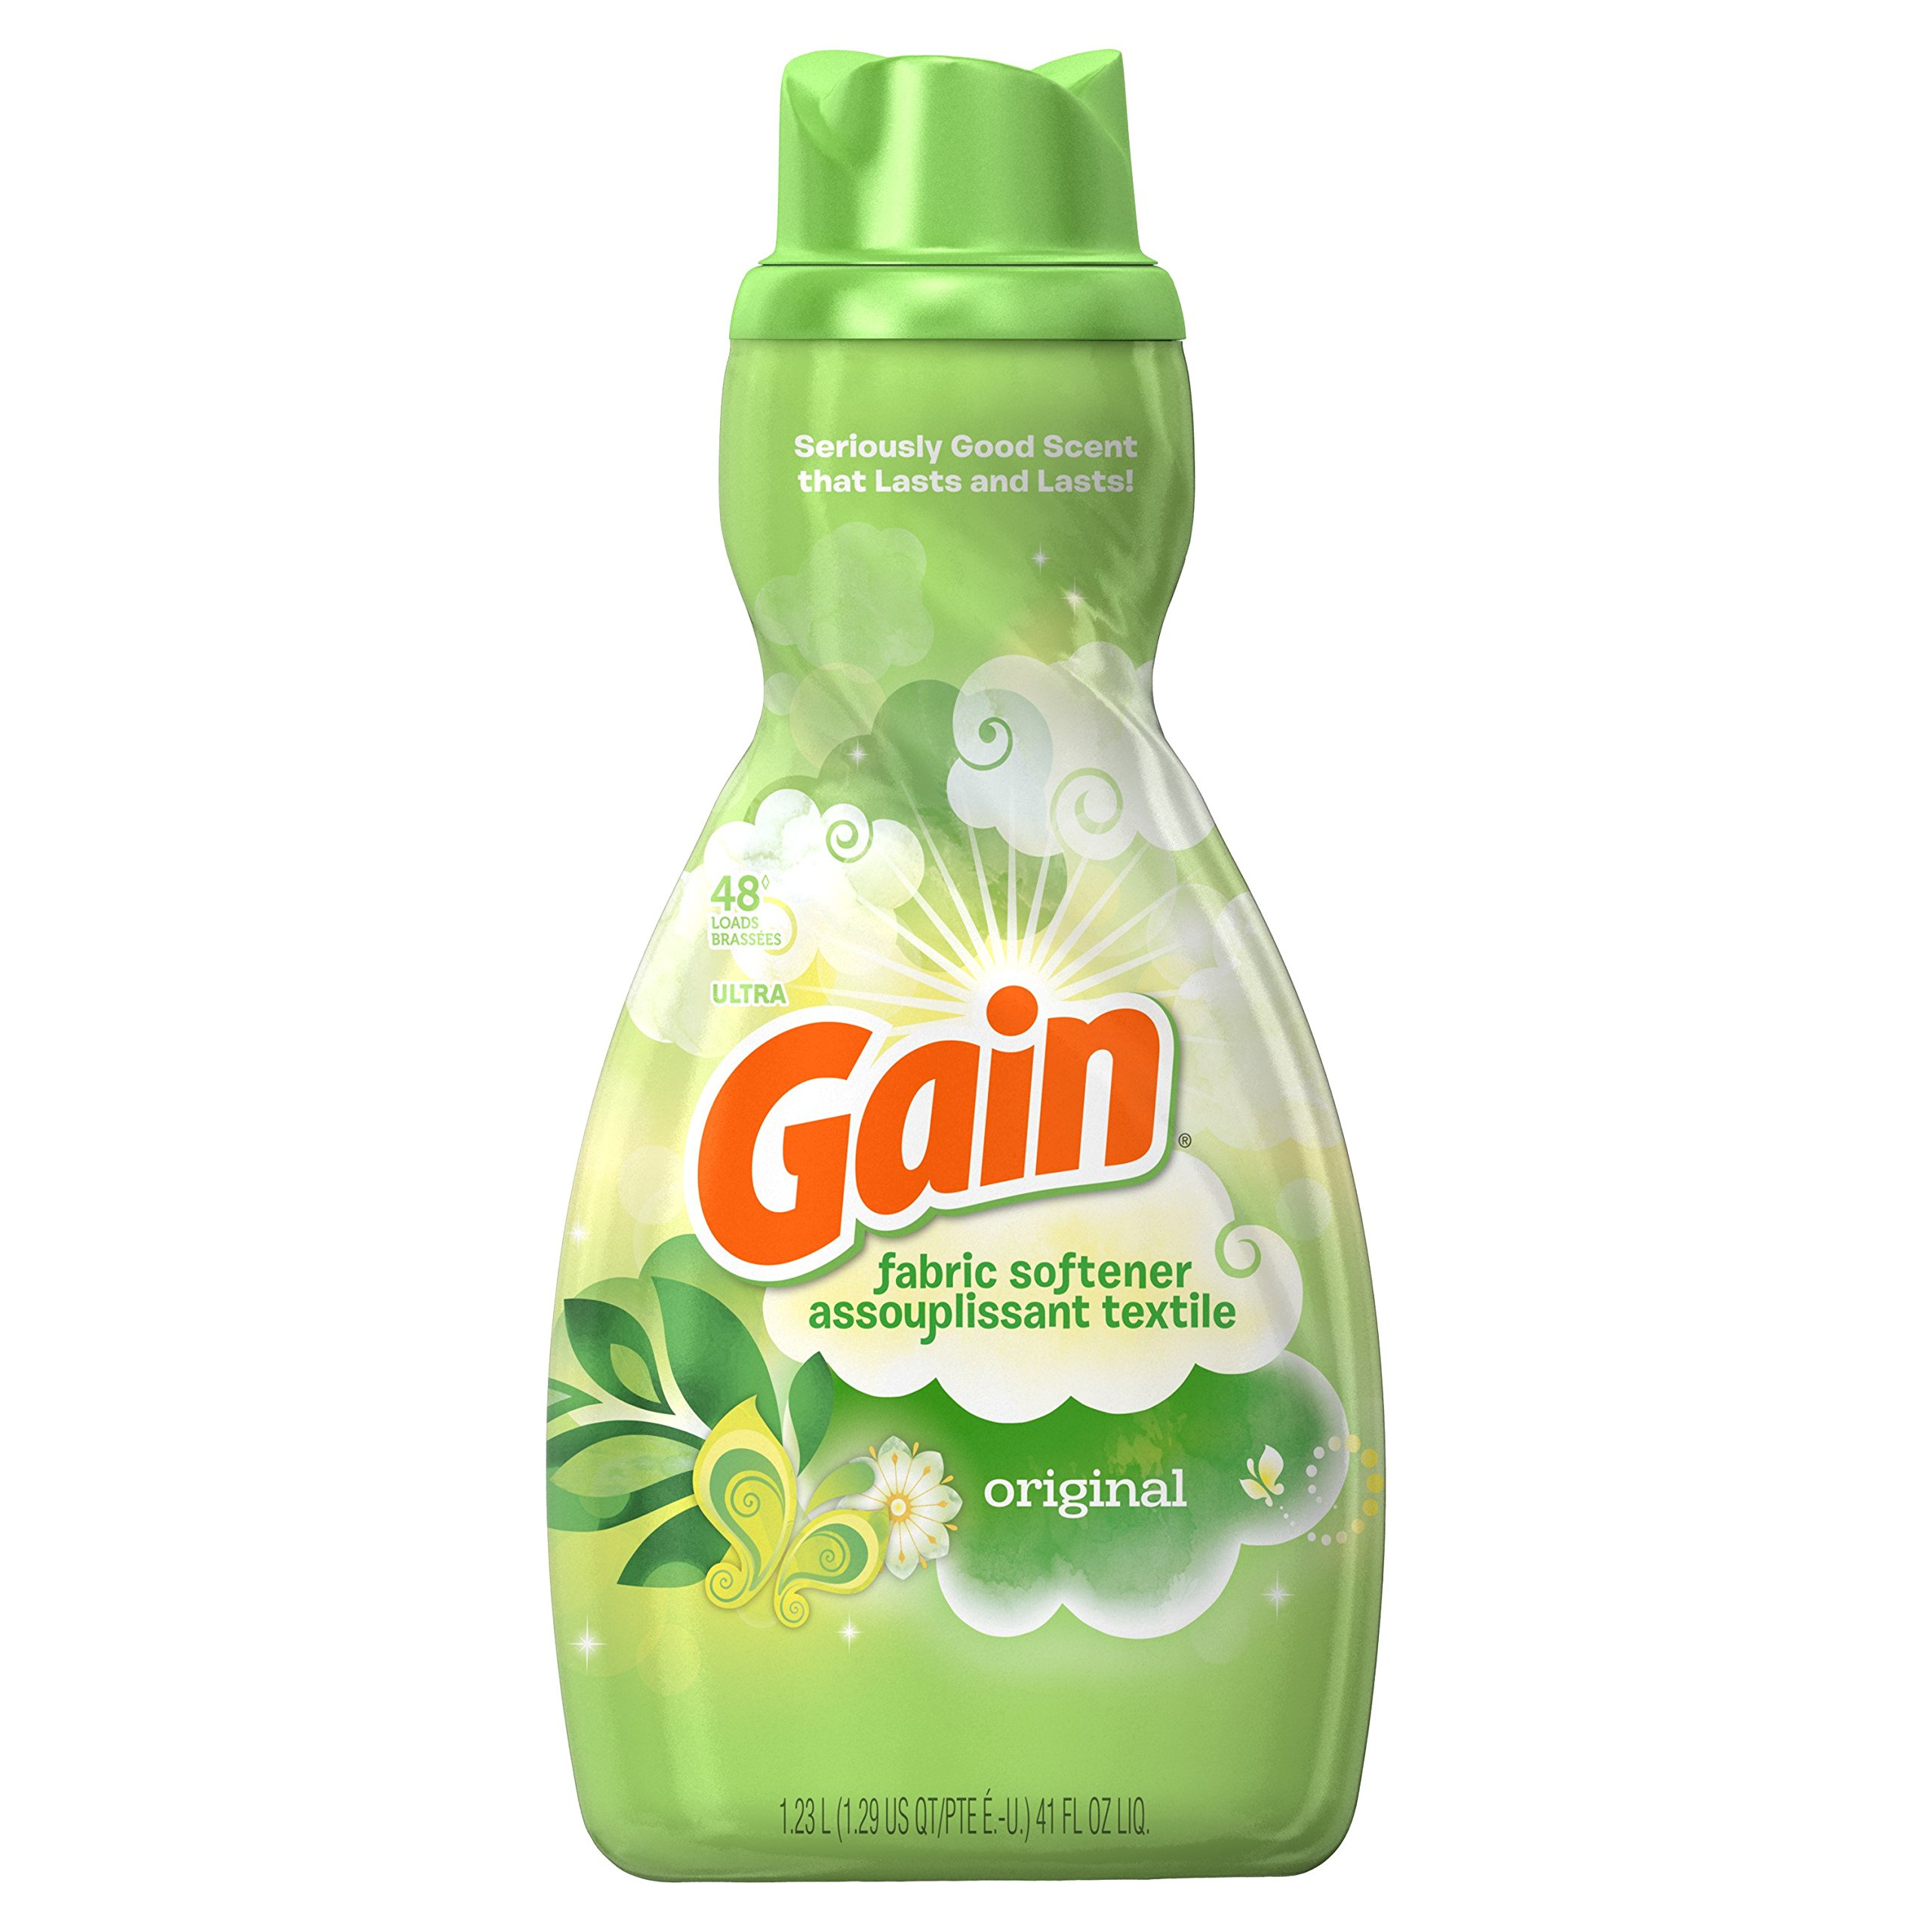 Gain Liquid Fabric Softener, Original, 41 fl oz, 4 Count by Gain (Image #2)